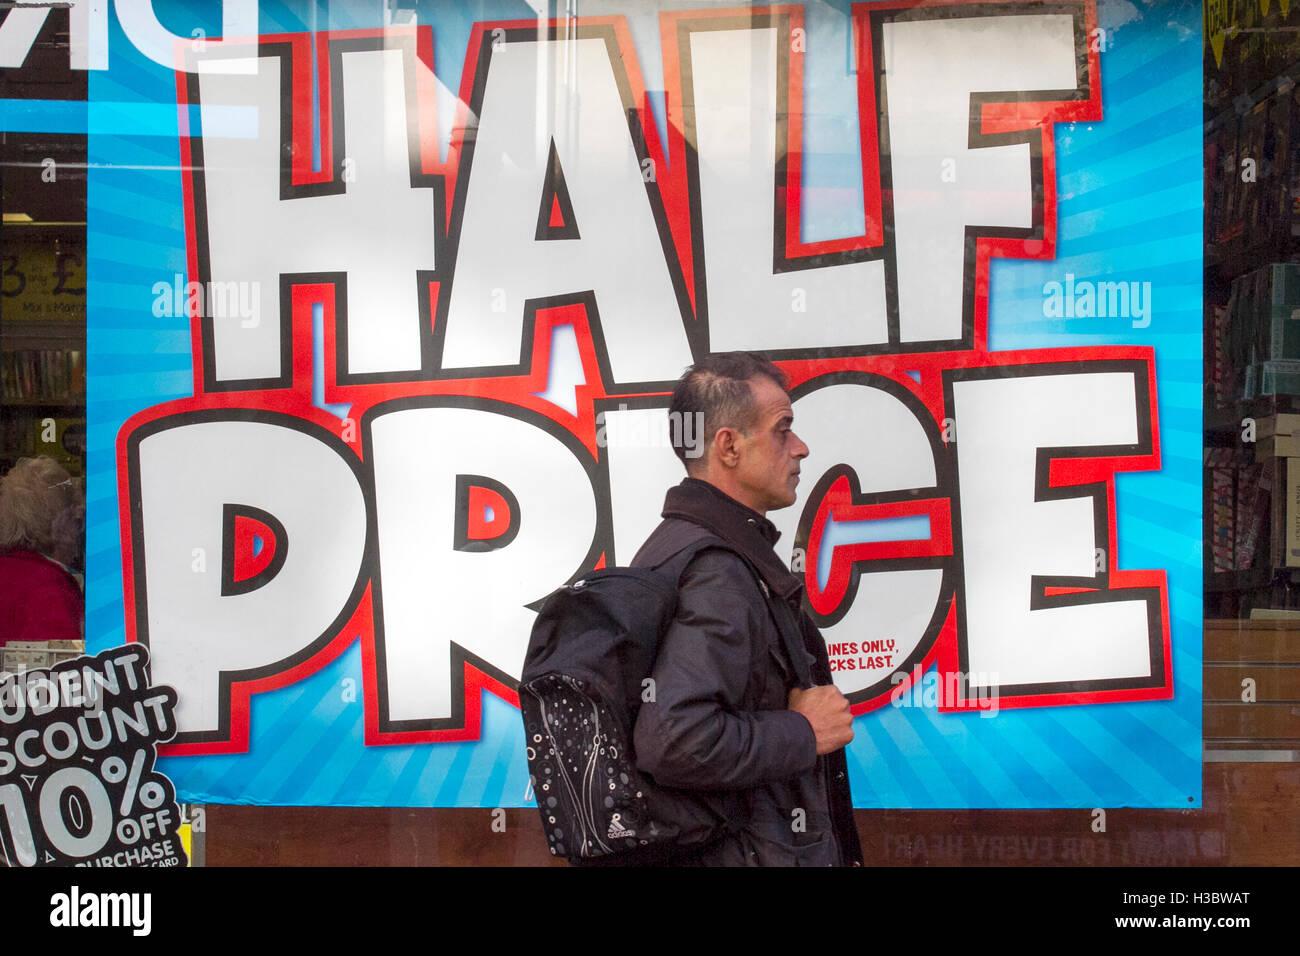 black friday sale sales shop shops discount discounts retail retailer offer offers shopper shopping reduction reduced - Stock Image